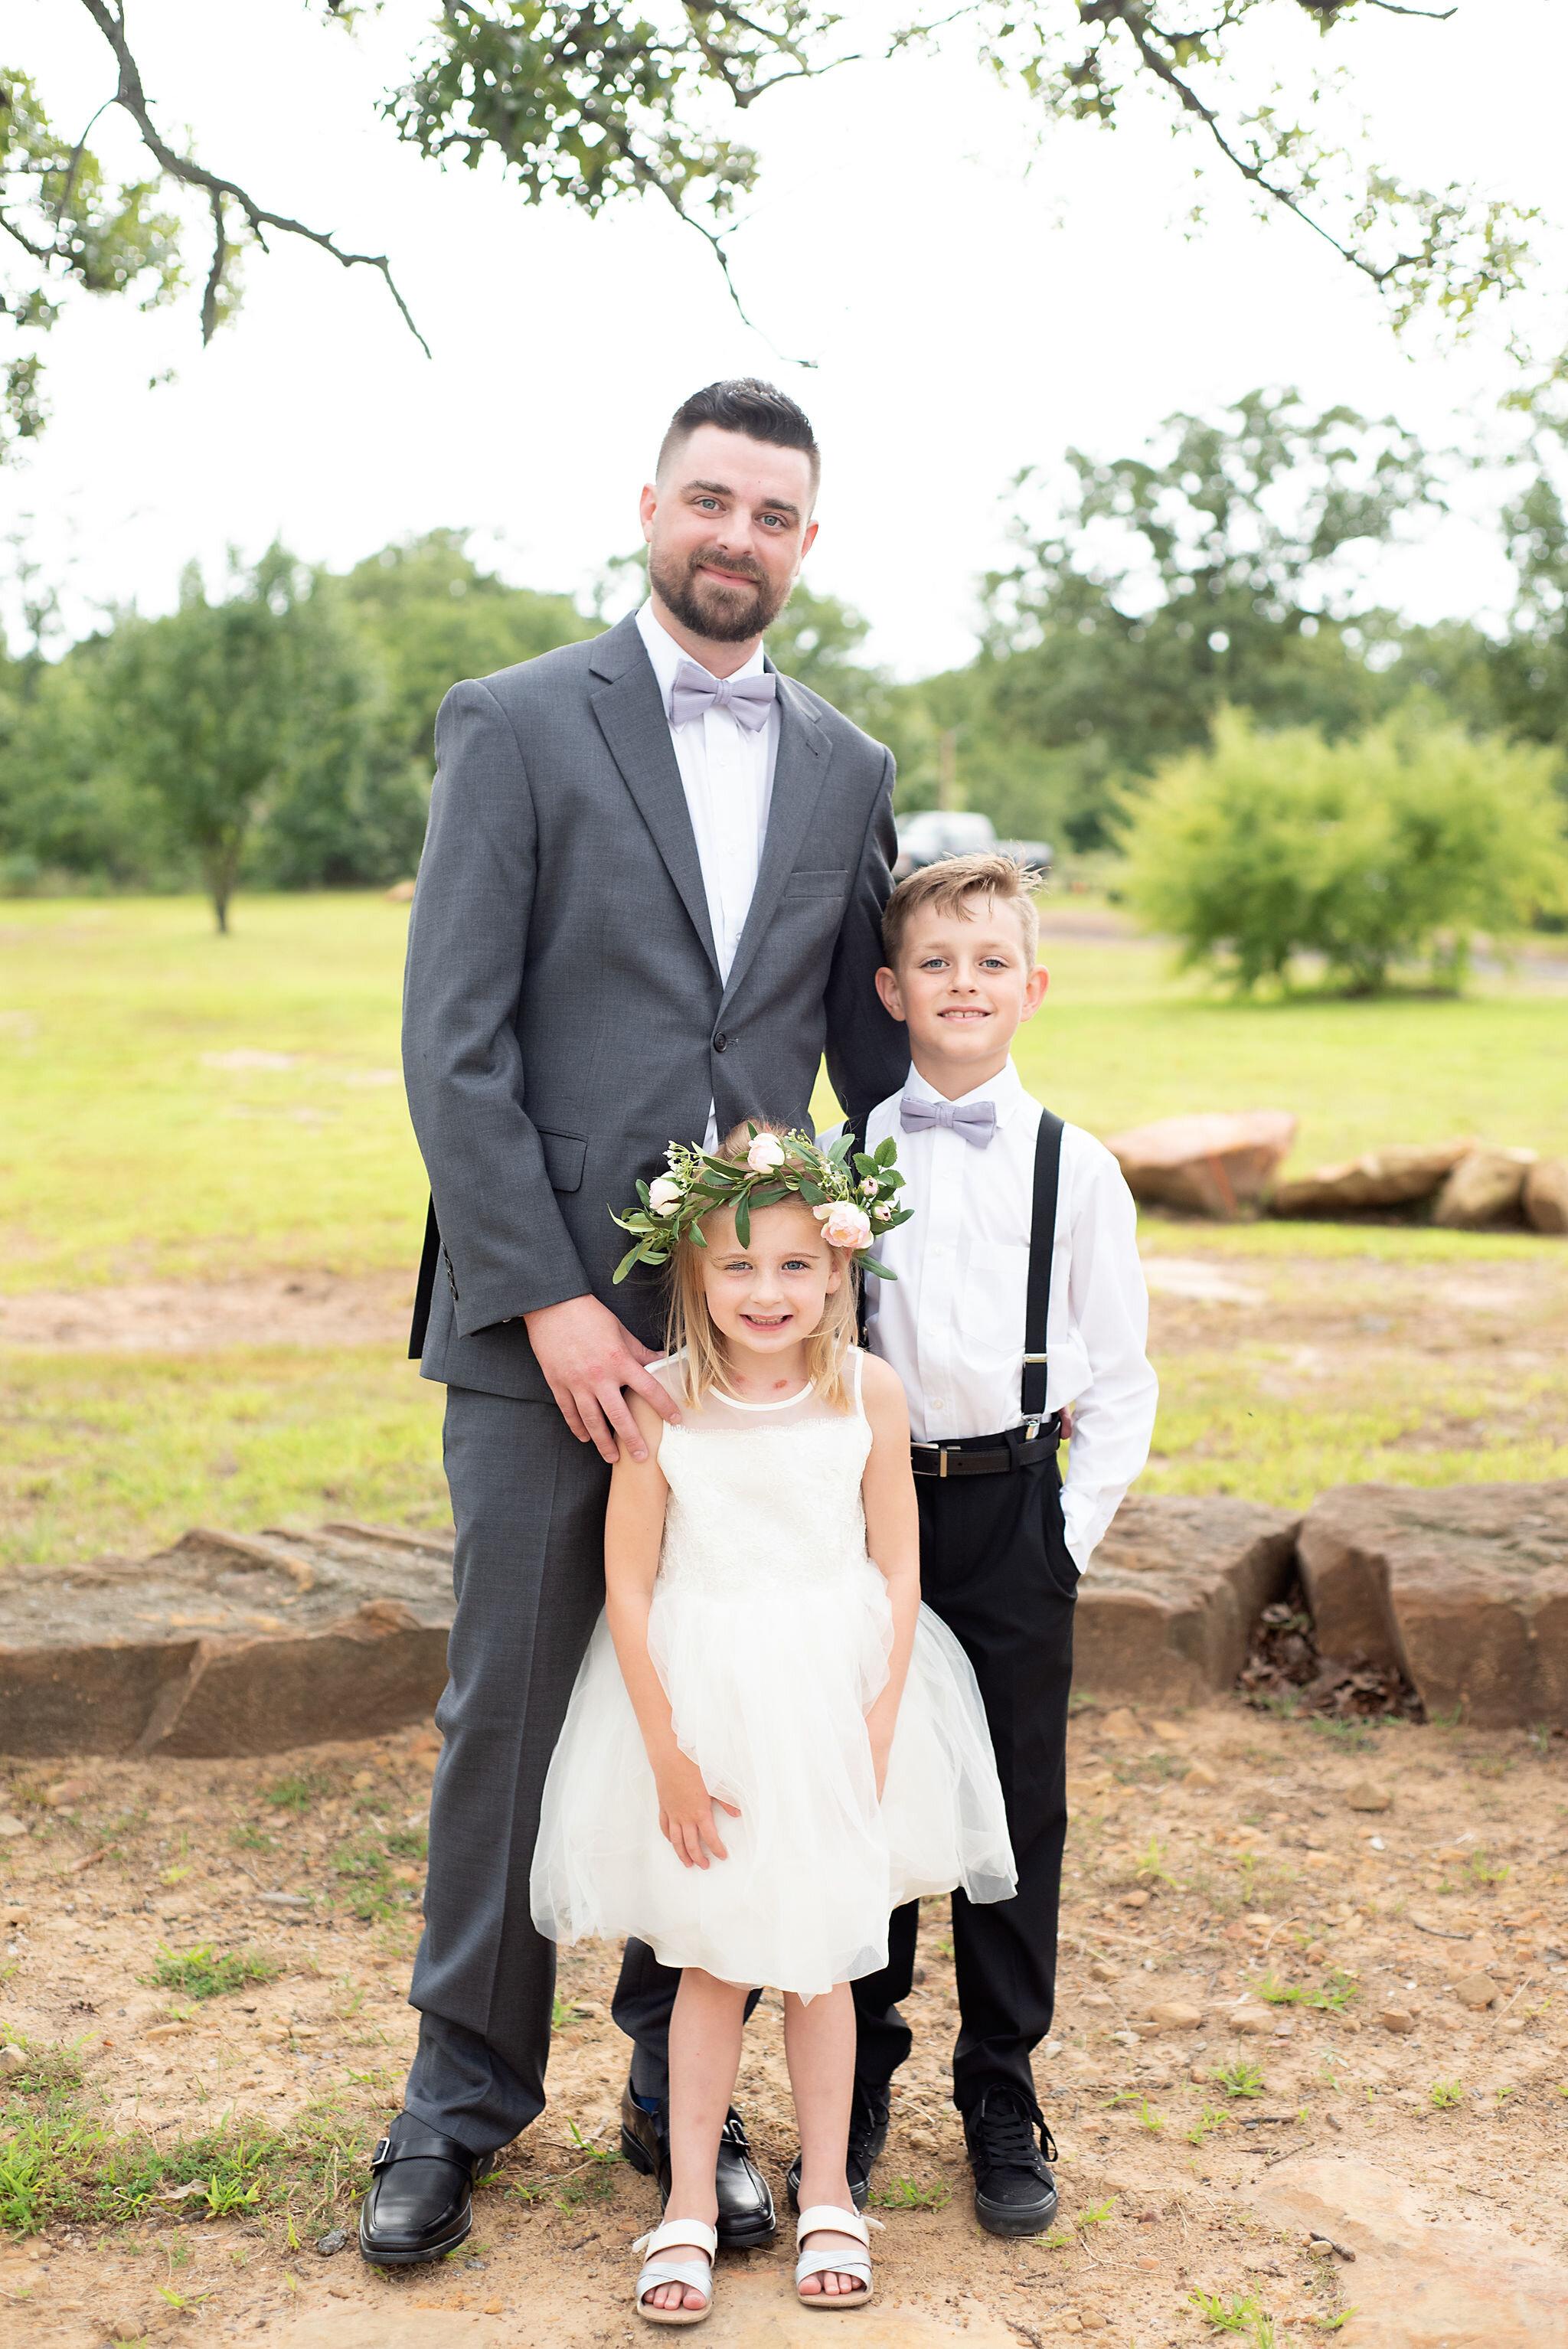 Oklahoma Summer Wedding Venue Dream Point Ranch 9.jpg